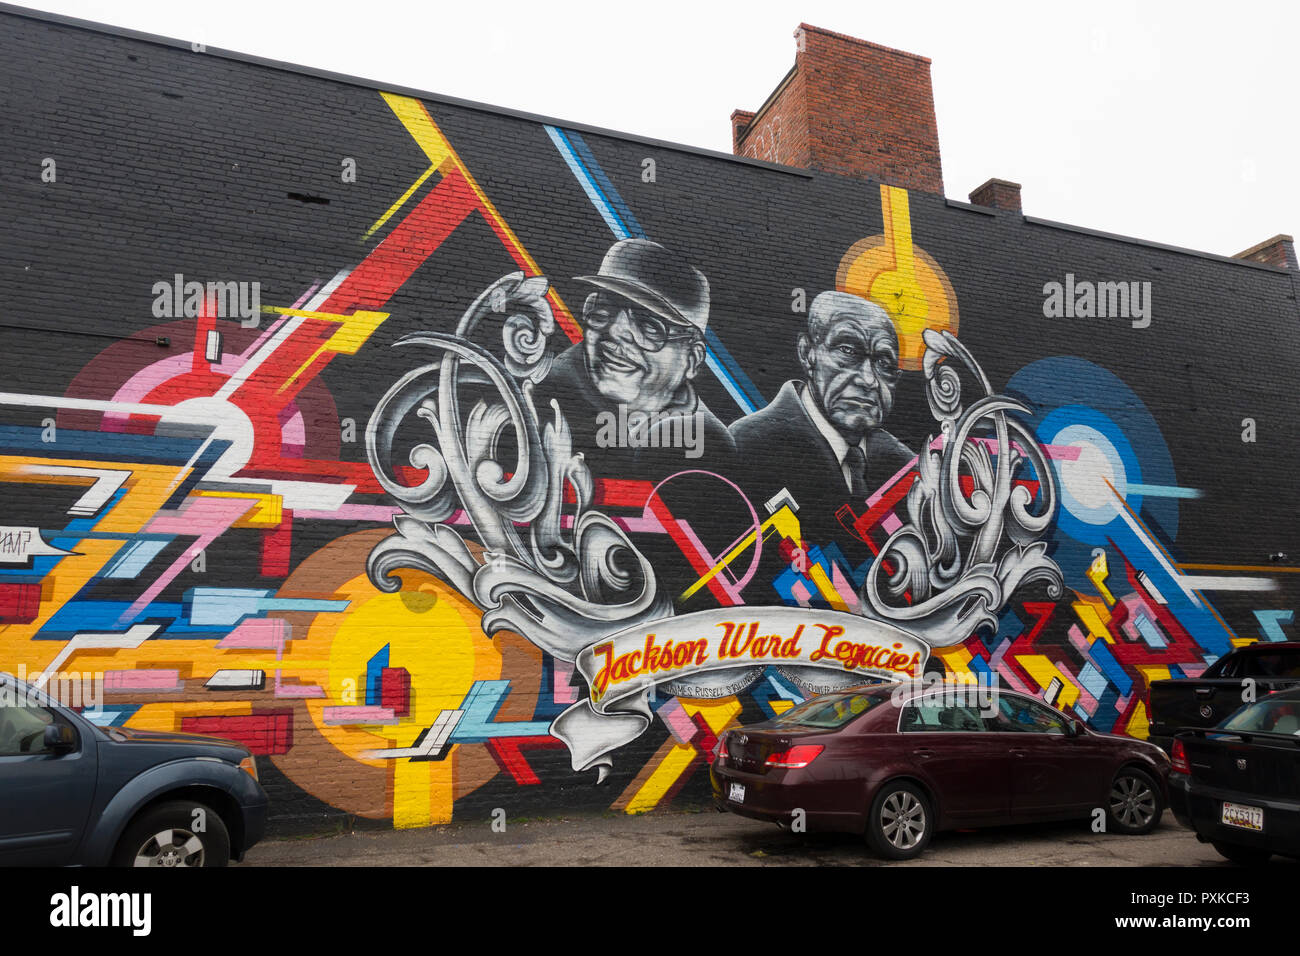 Jackson ward mural Richmond Virginia - Stock Image